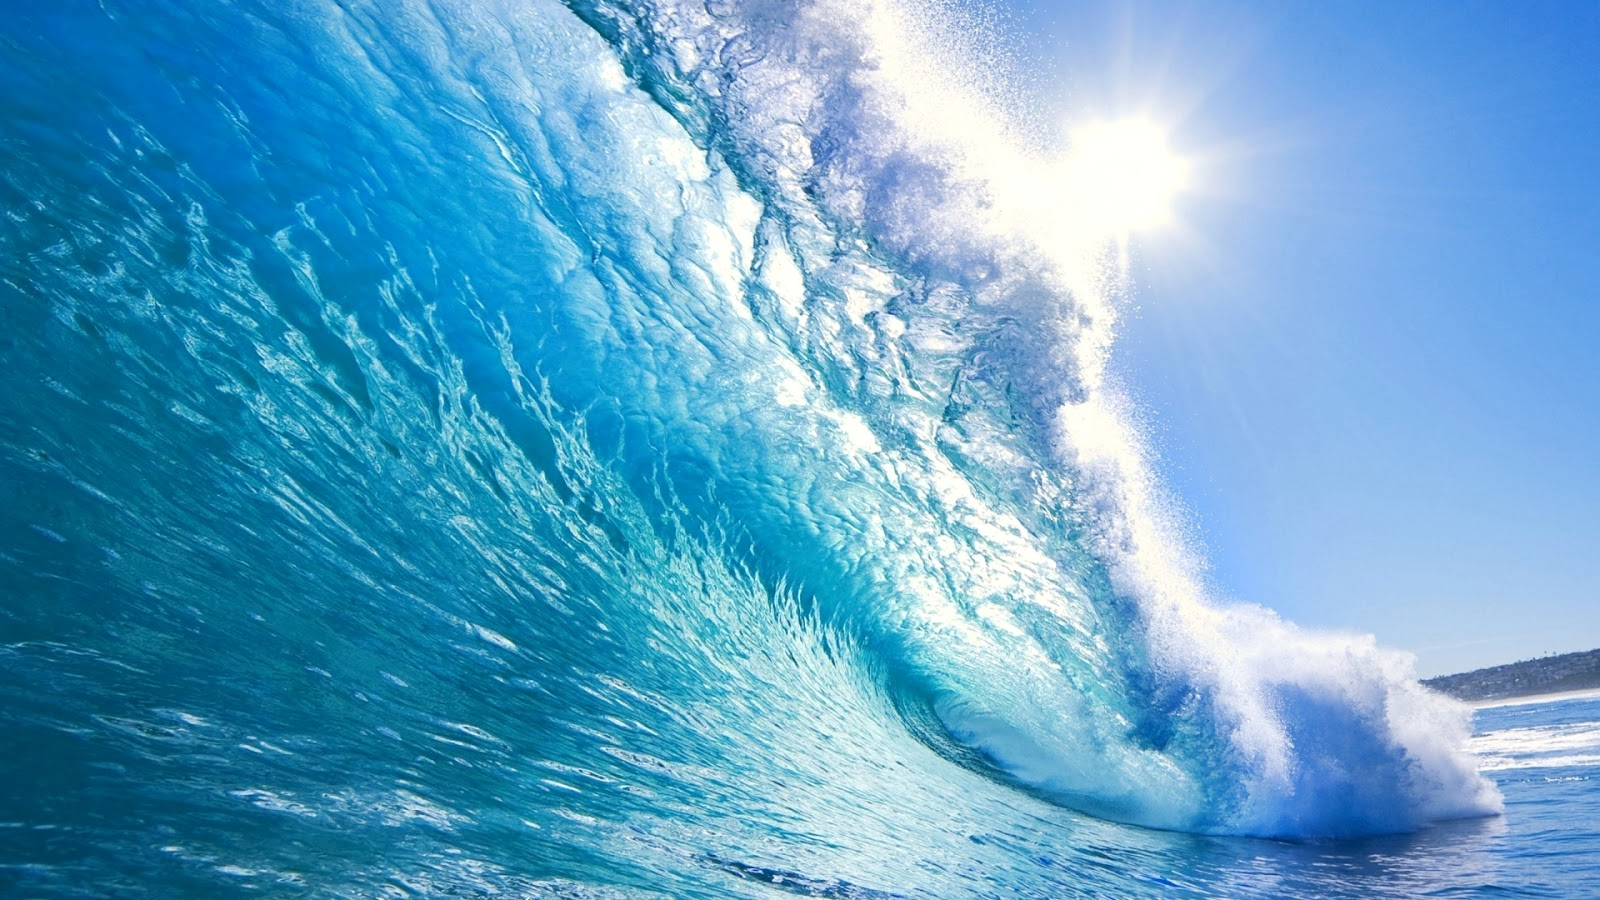 Beautiful Wallpapers water waves wallpaper 1600x900